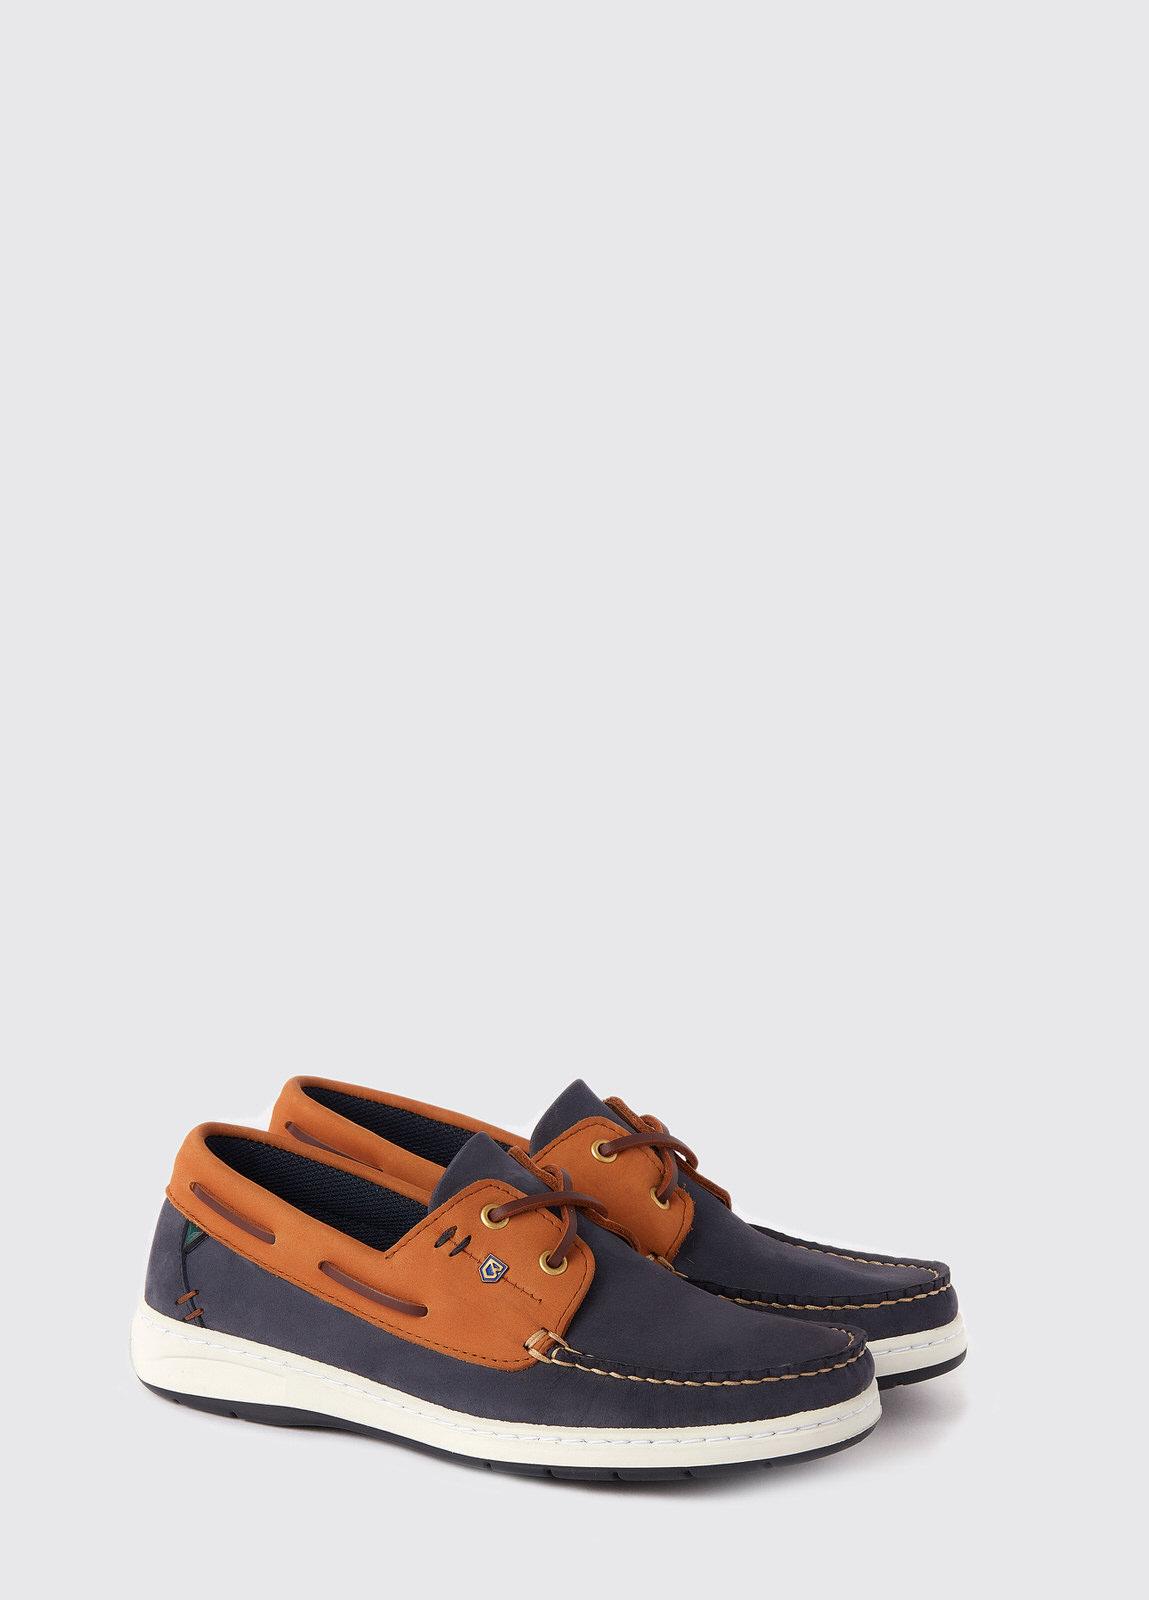 Florida Deck shoes - Denim/Tan